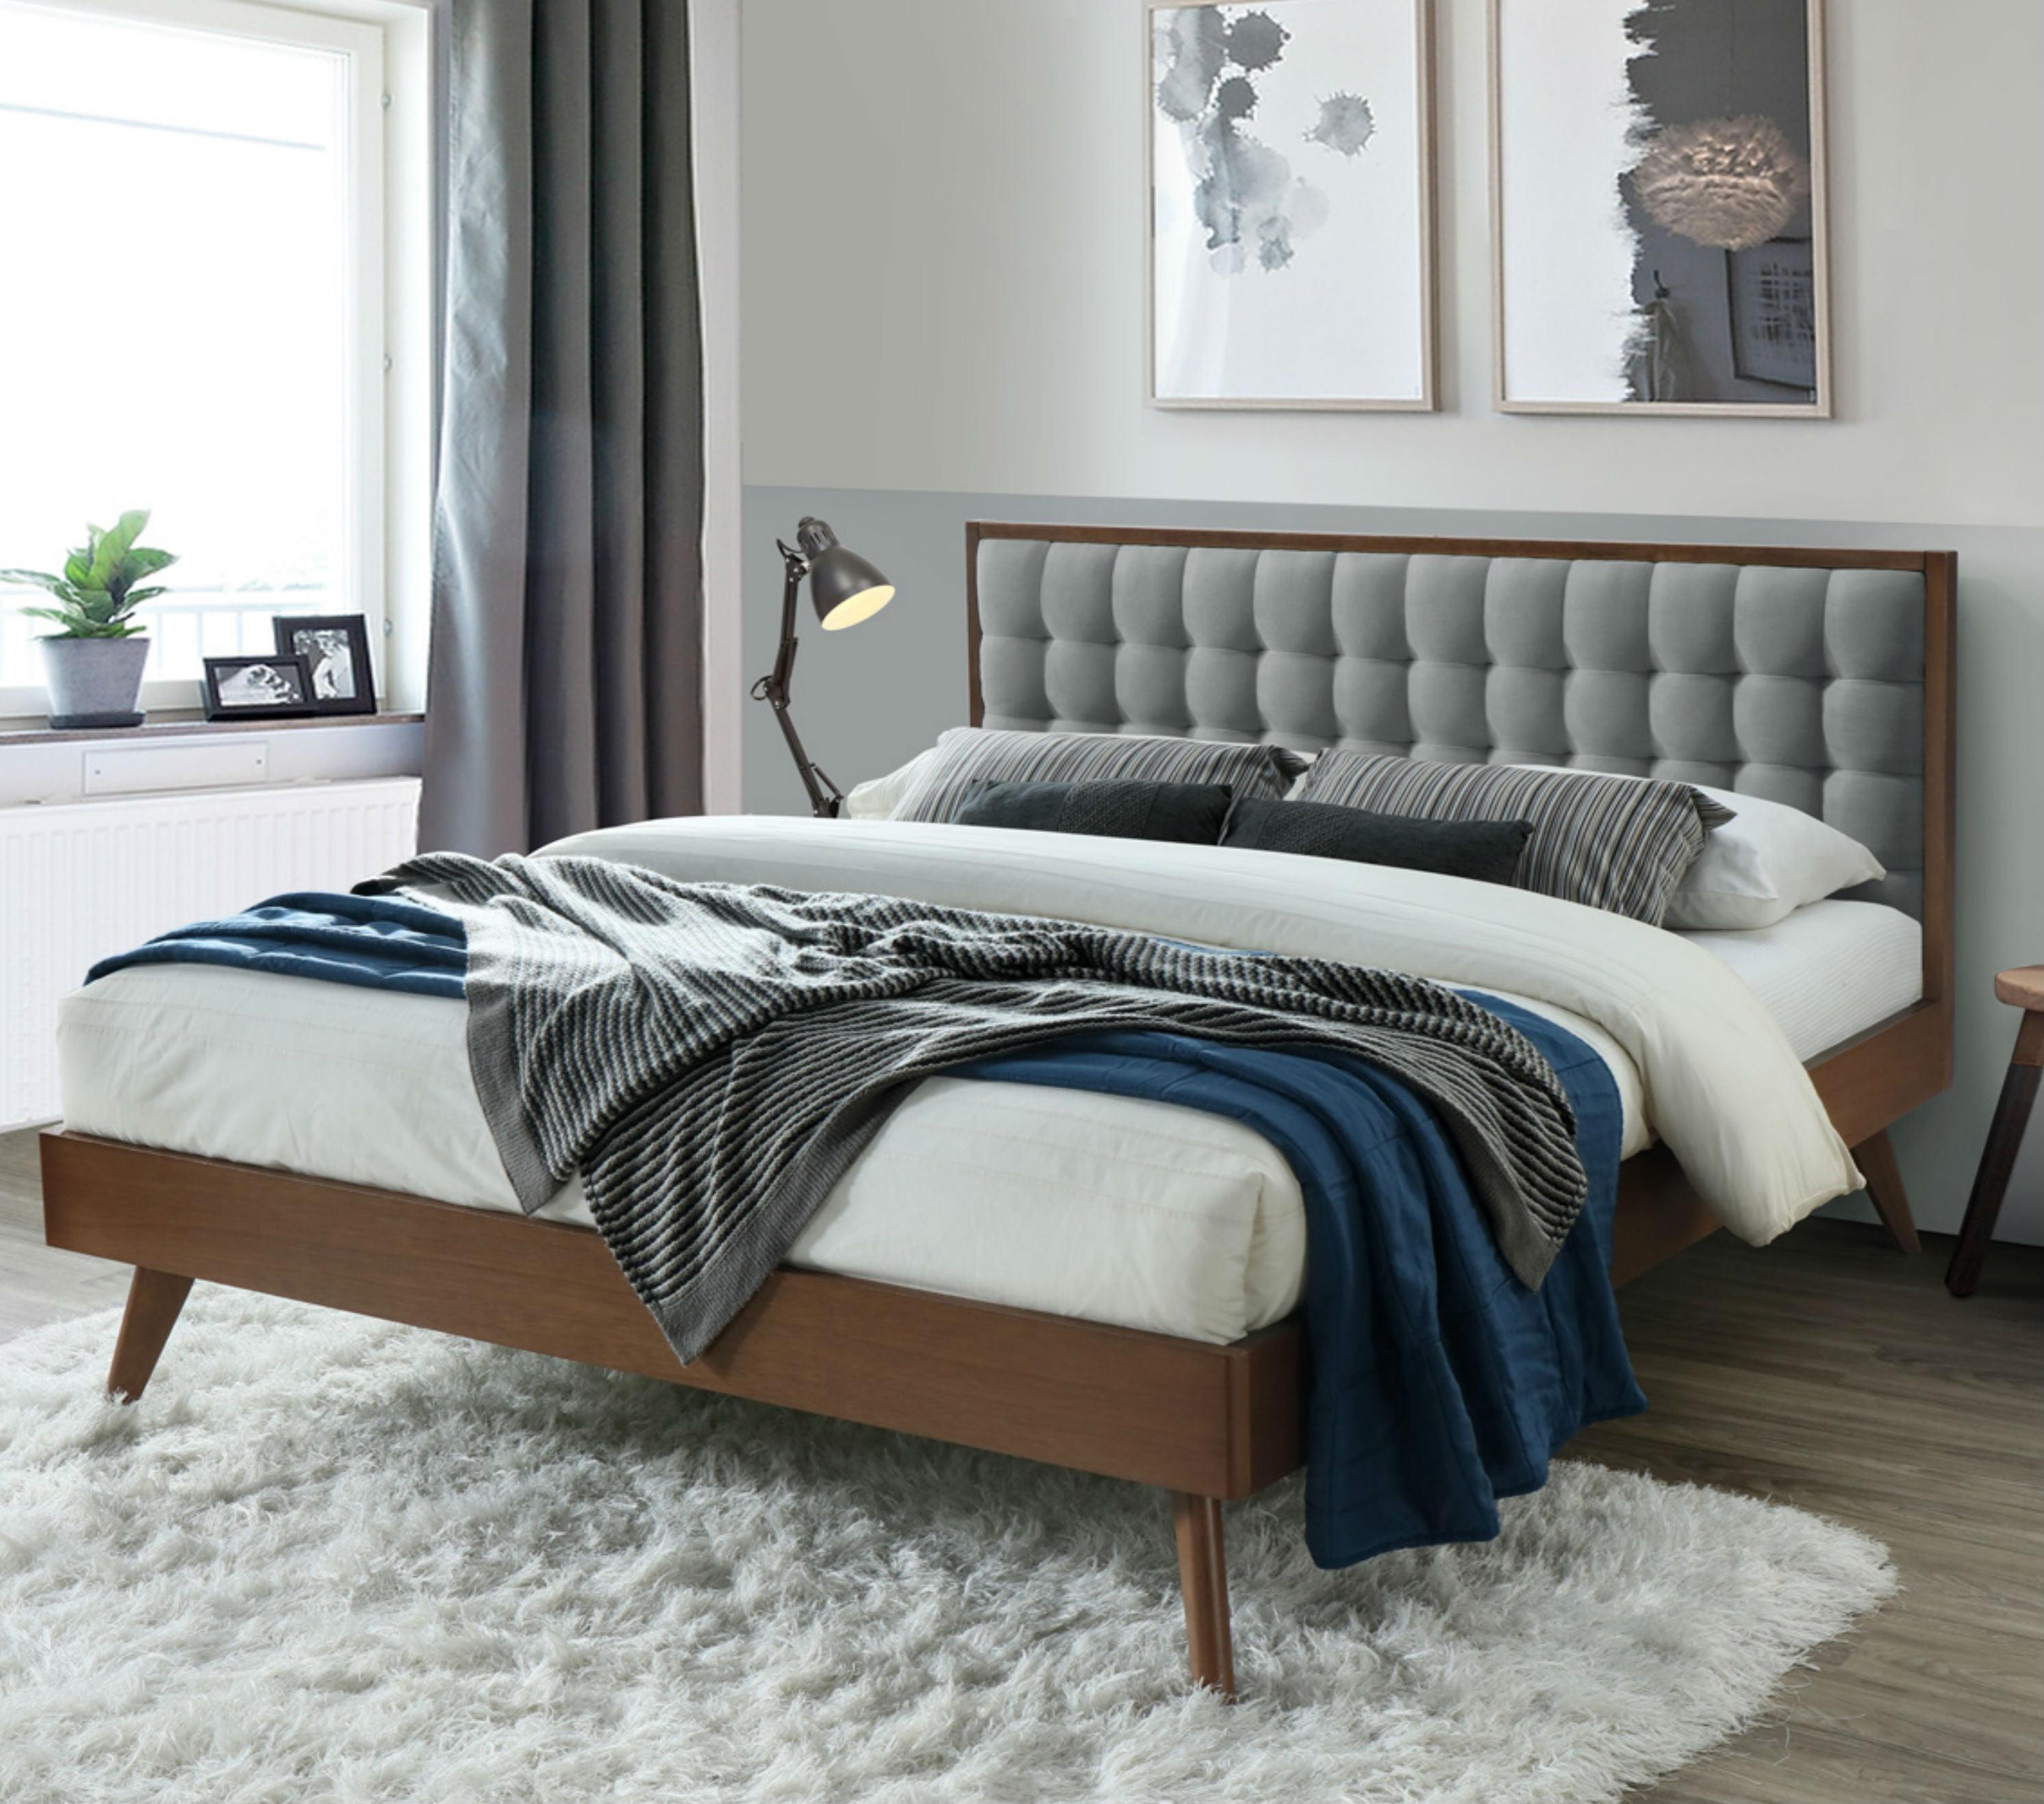 Dg Casa Soloman Mid Century Modern Tufted Upholstered Platform Bed Frame King Size In Grey Fabric Walmart Com Walmart Com